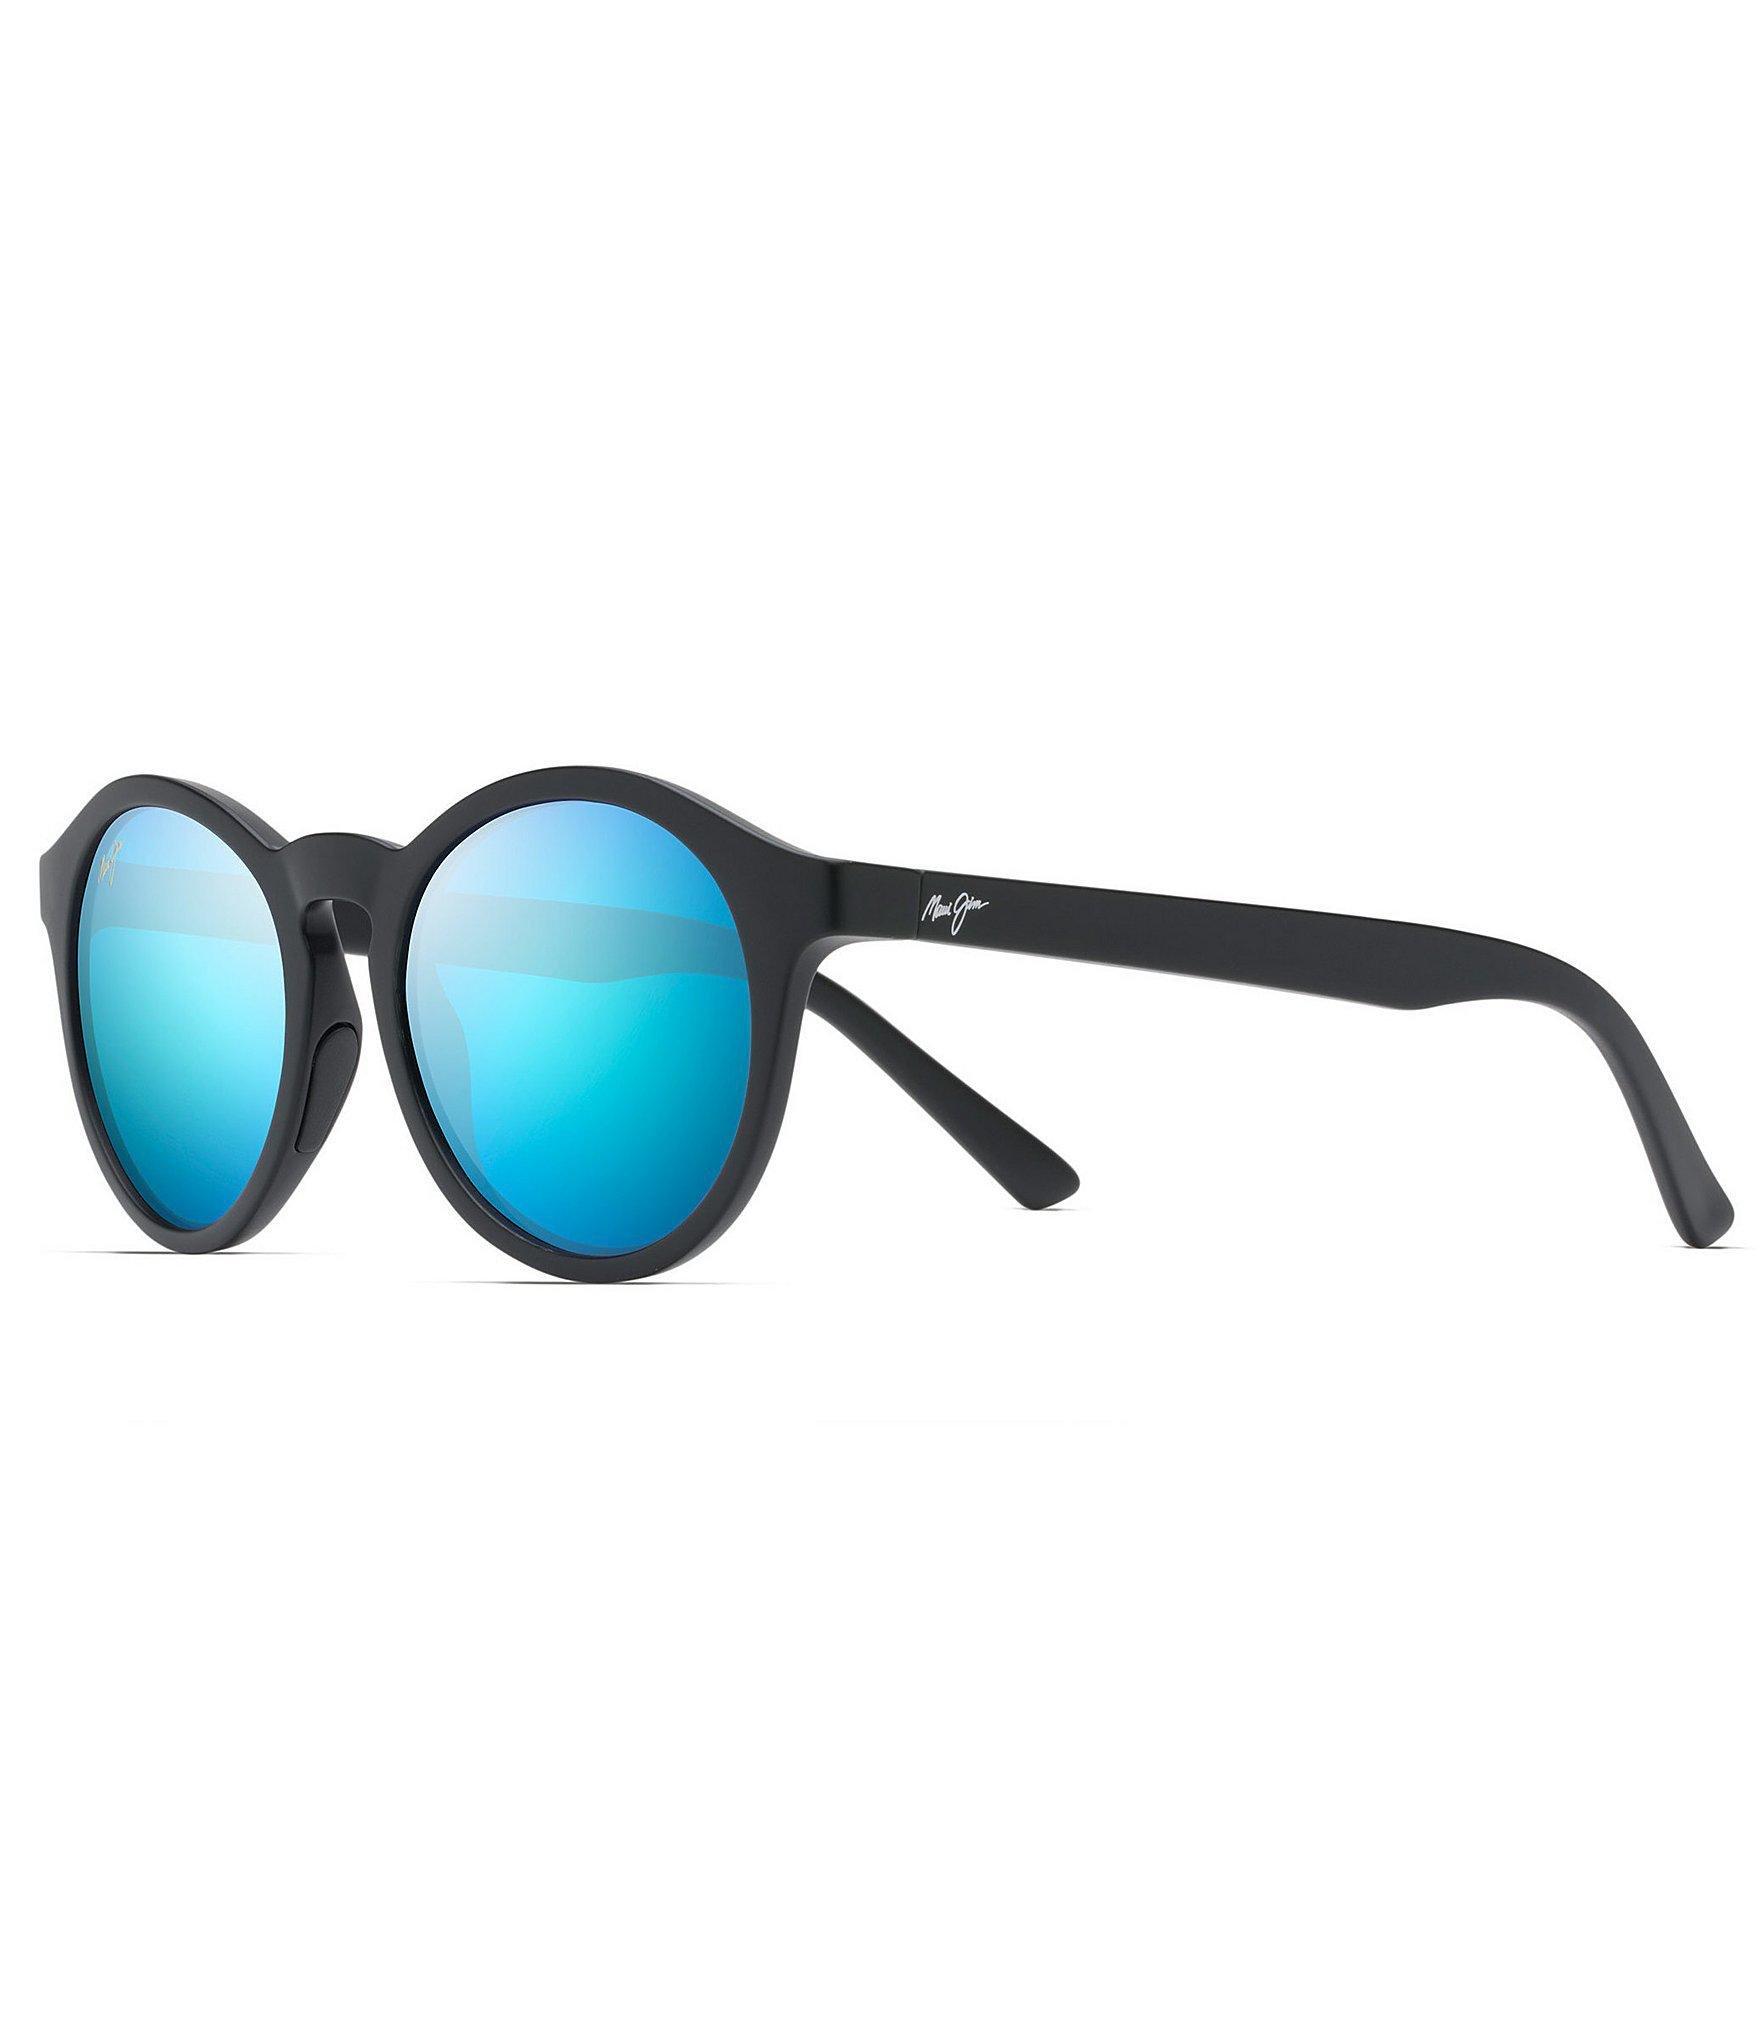 25687c0866 Lyst - Maui Jim Pineapple Polarized Classic Sunglasses in Black for Men